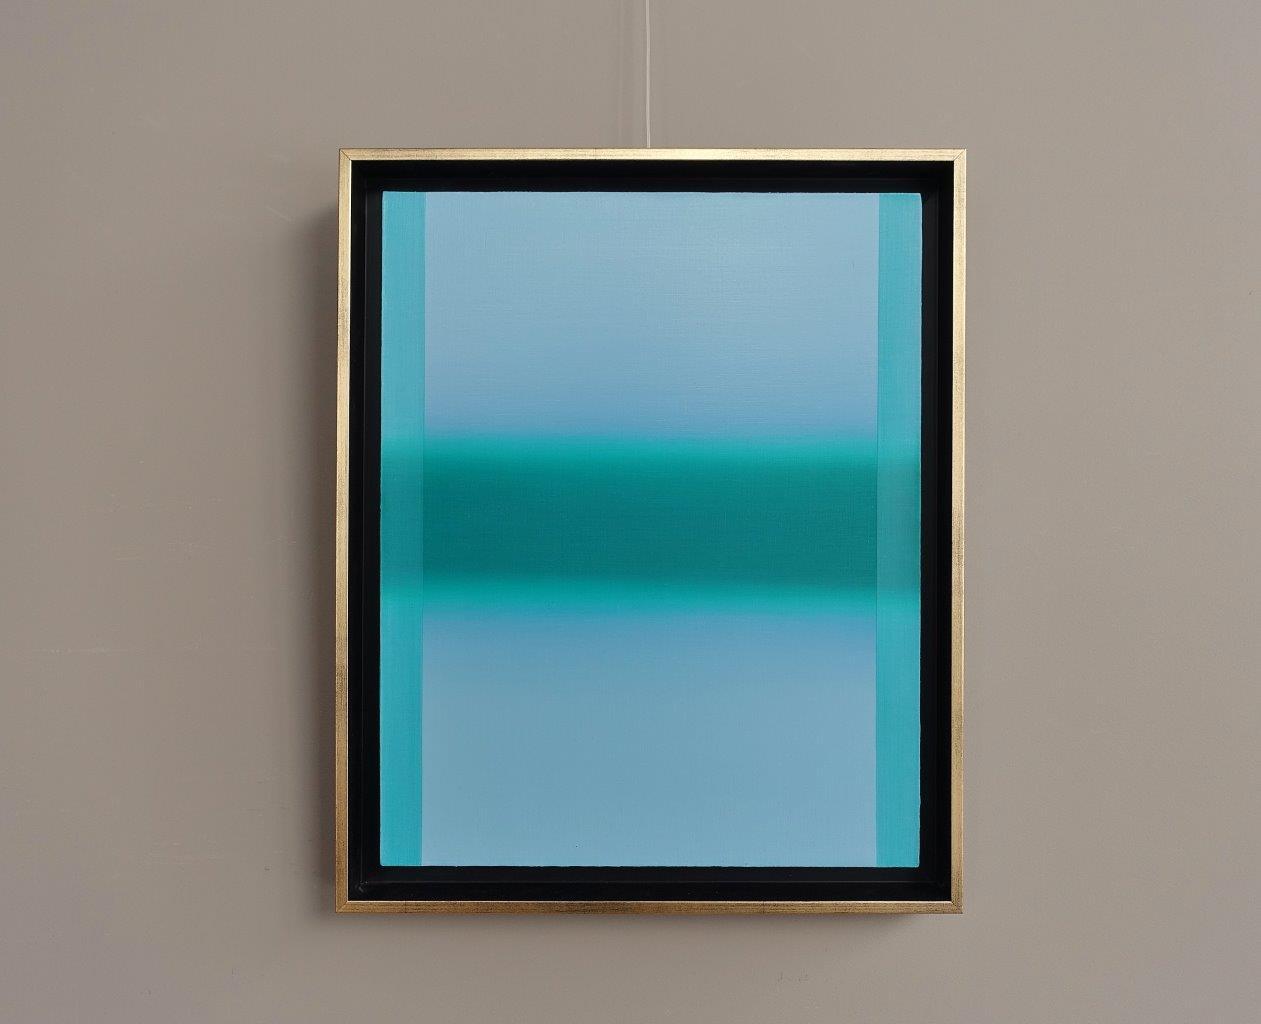 Anna Podlewska : Turquoise on blue